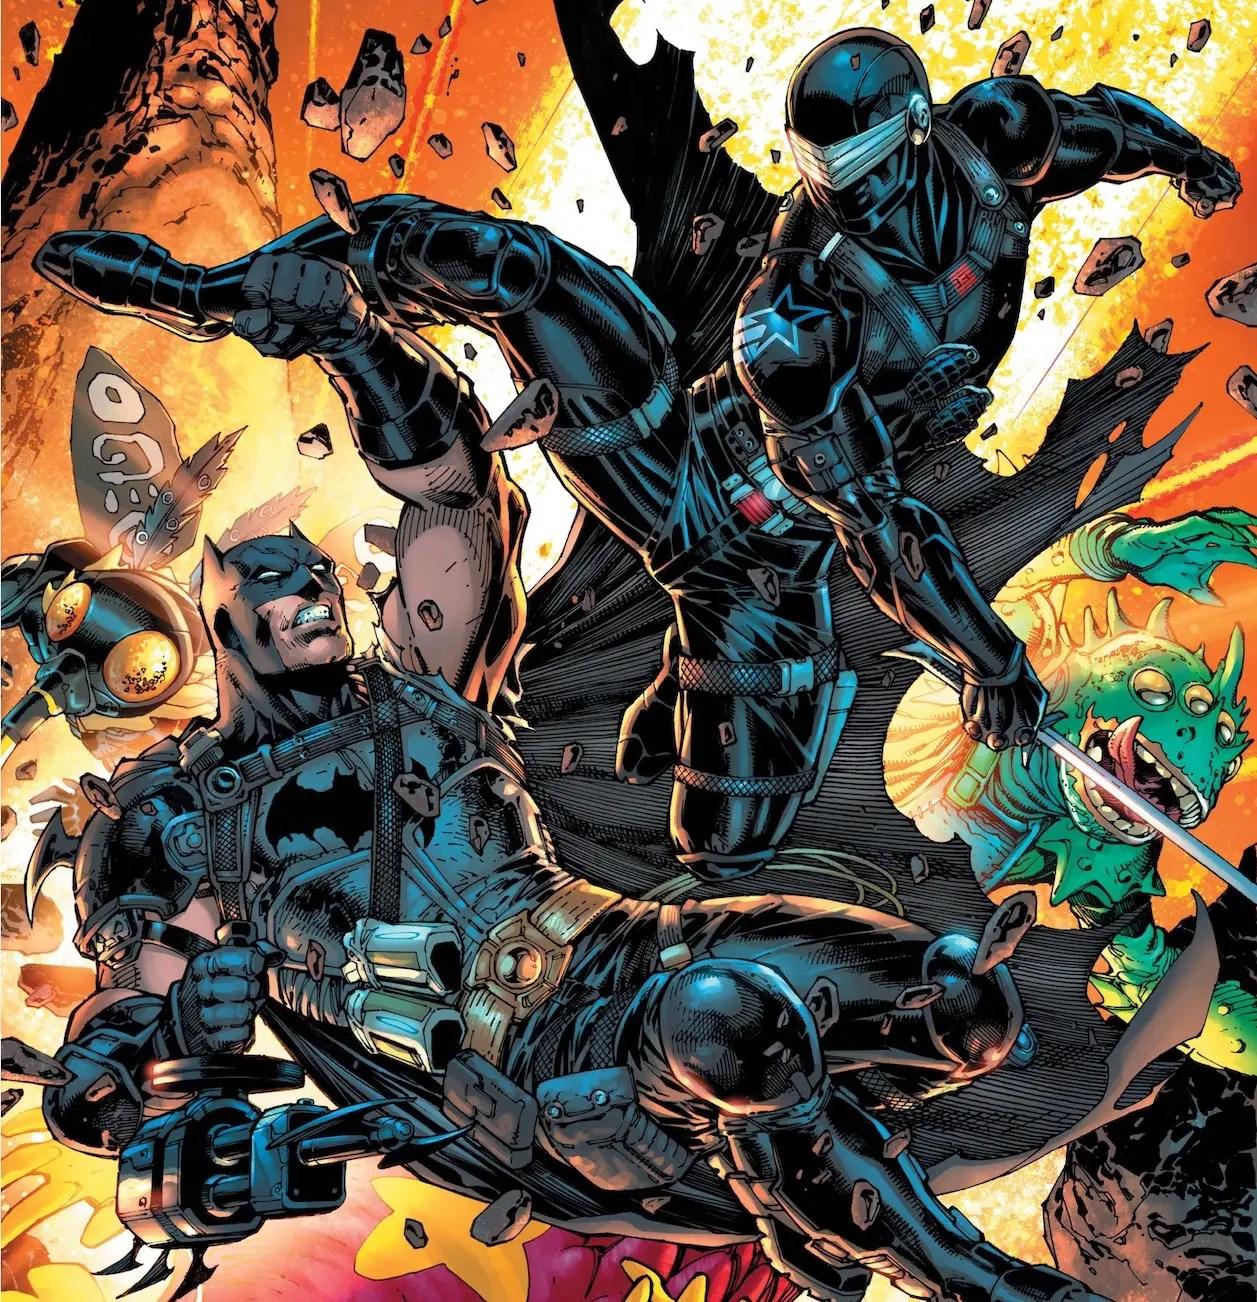 'Batman/Fortnite: Zero Point' #3 is all about Batman vs. Snake Eyes